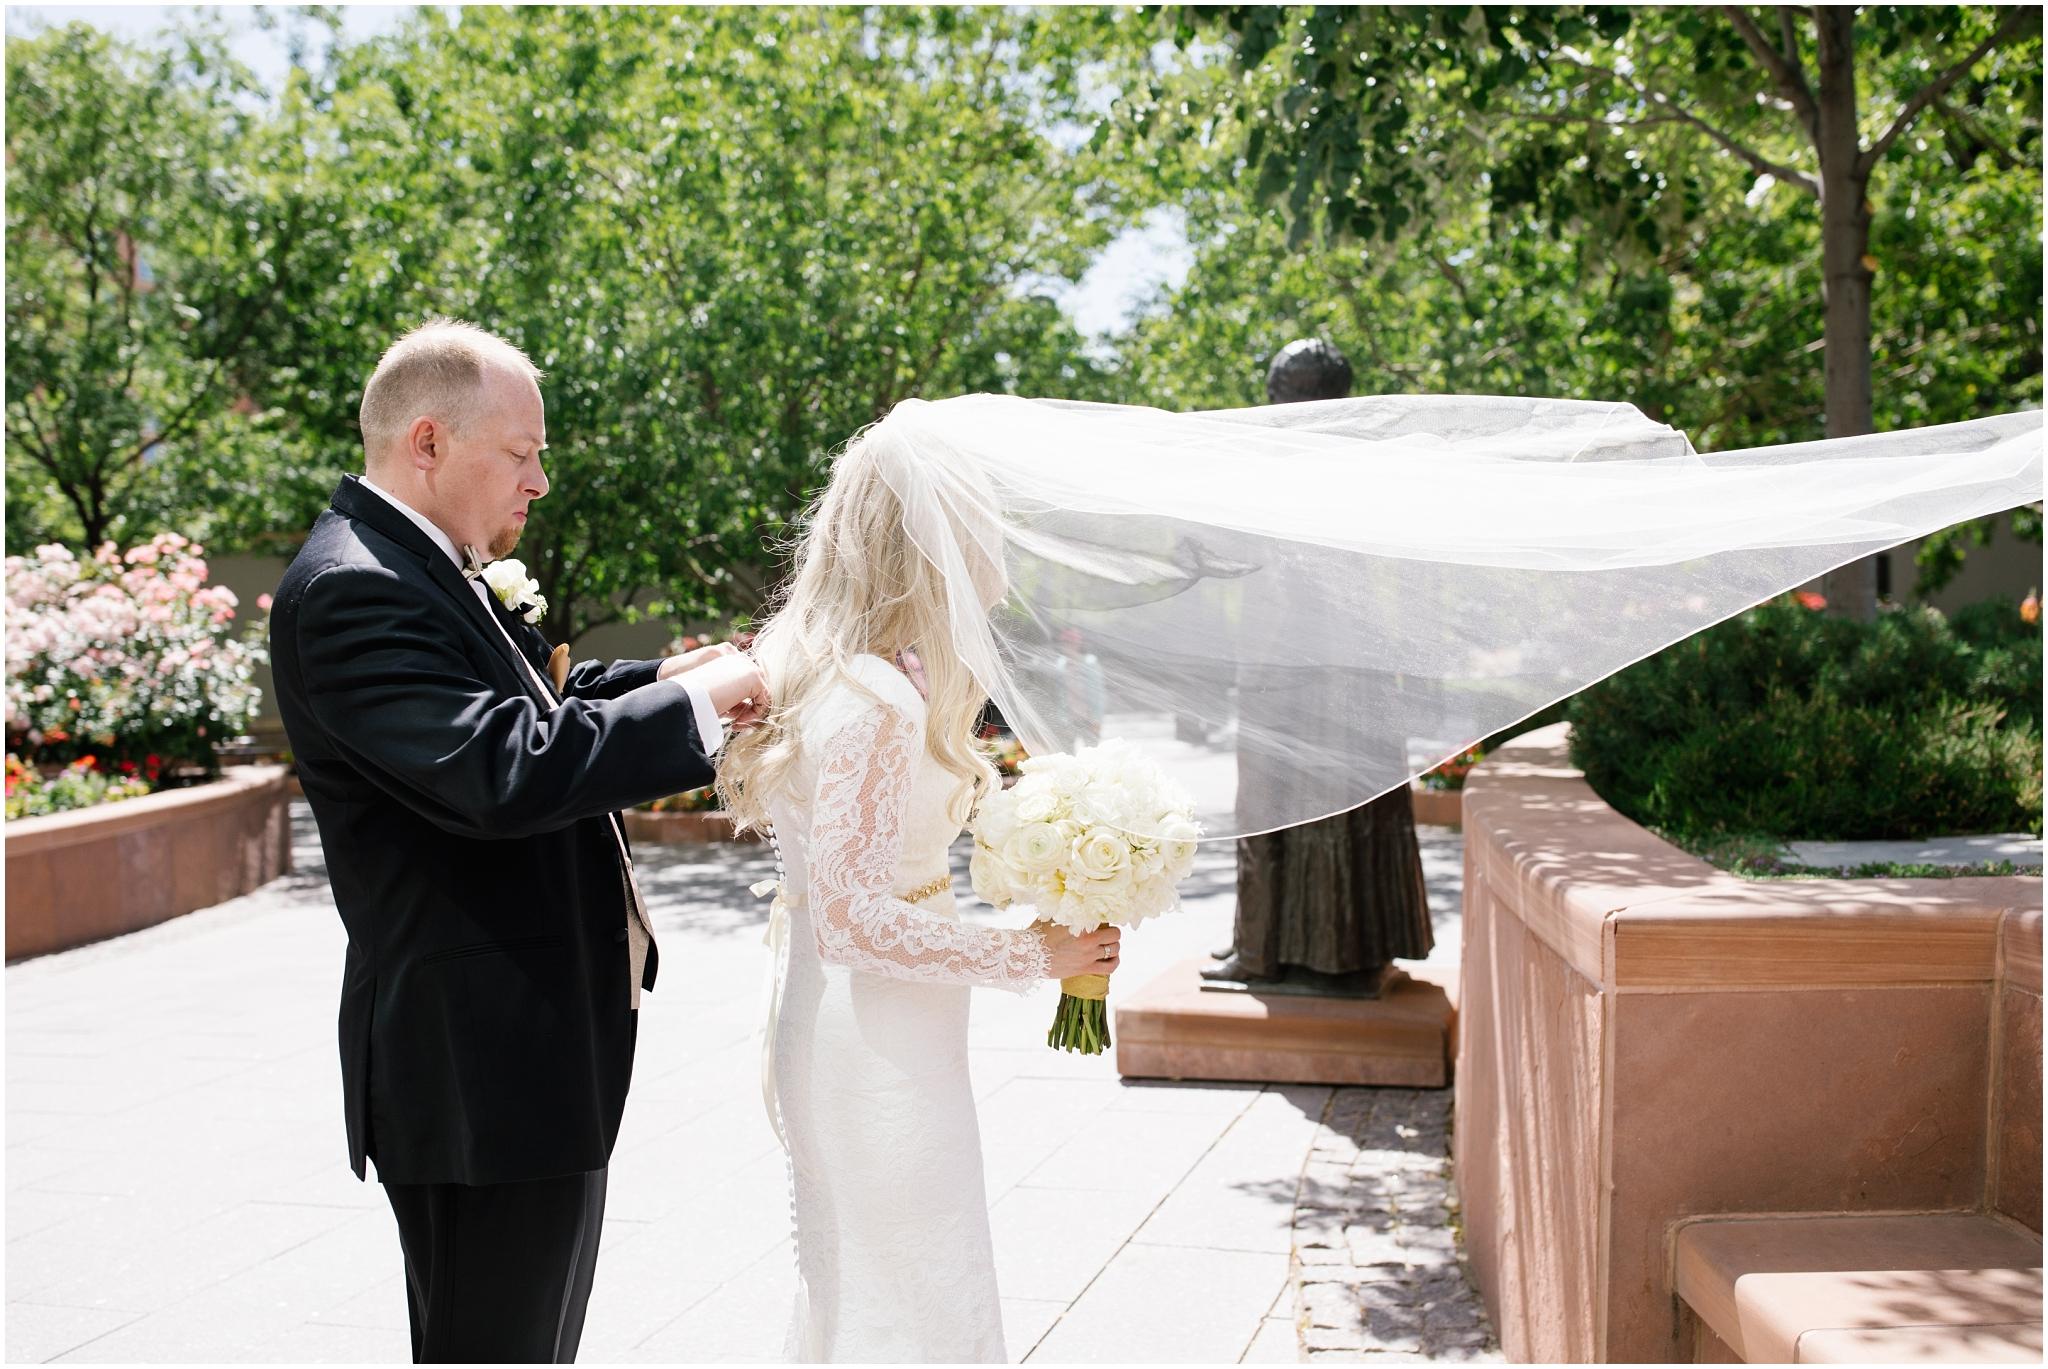 CherylandTyler-232_Lizzie-B-Imagery-Utah-Wedding-Photographer-Salt-Lake-City-Temple-Wells-Fargo-Building-Reception.jpg